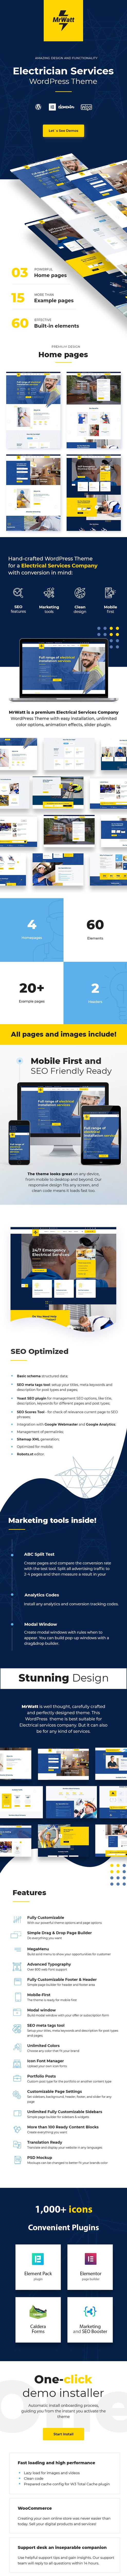 MrWatt - Electrical Services  WordPress Theme